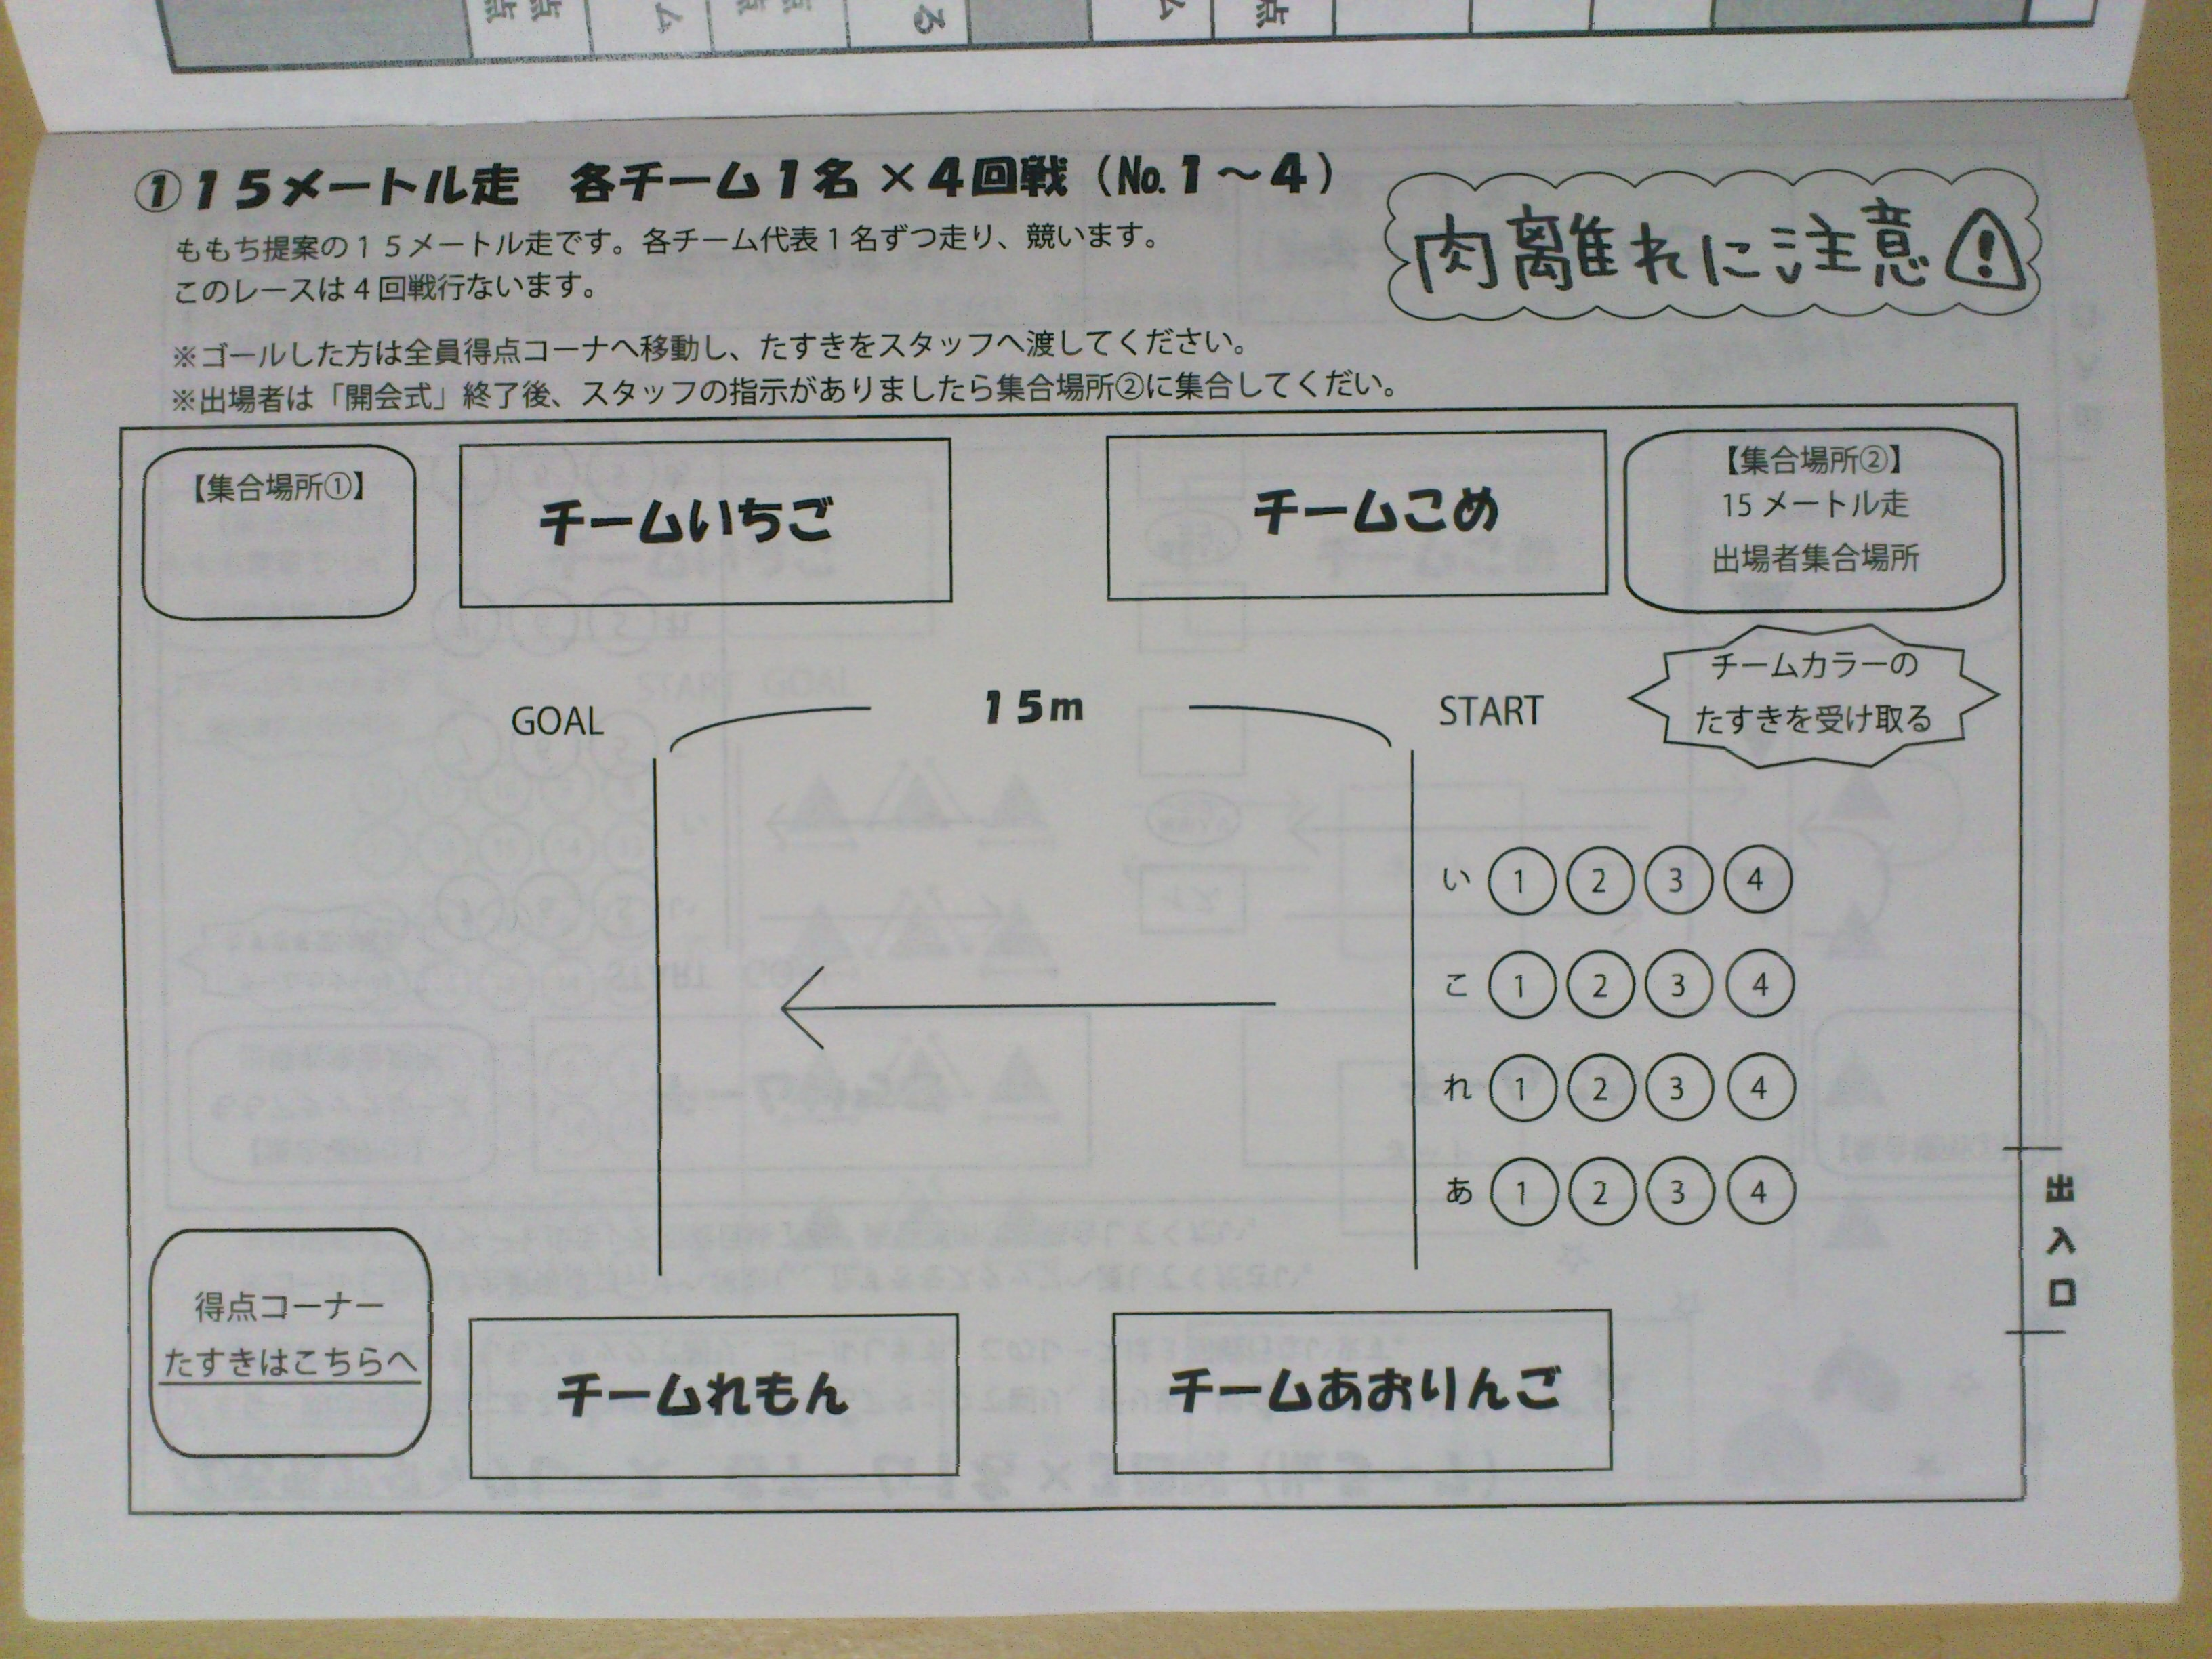 f:id:kasukabe:20121110162147j:plain:w350